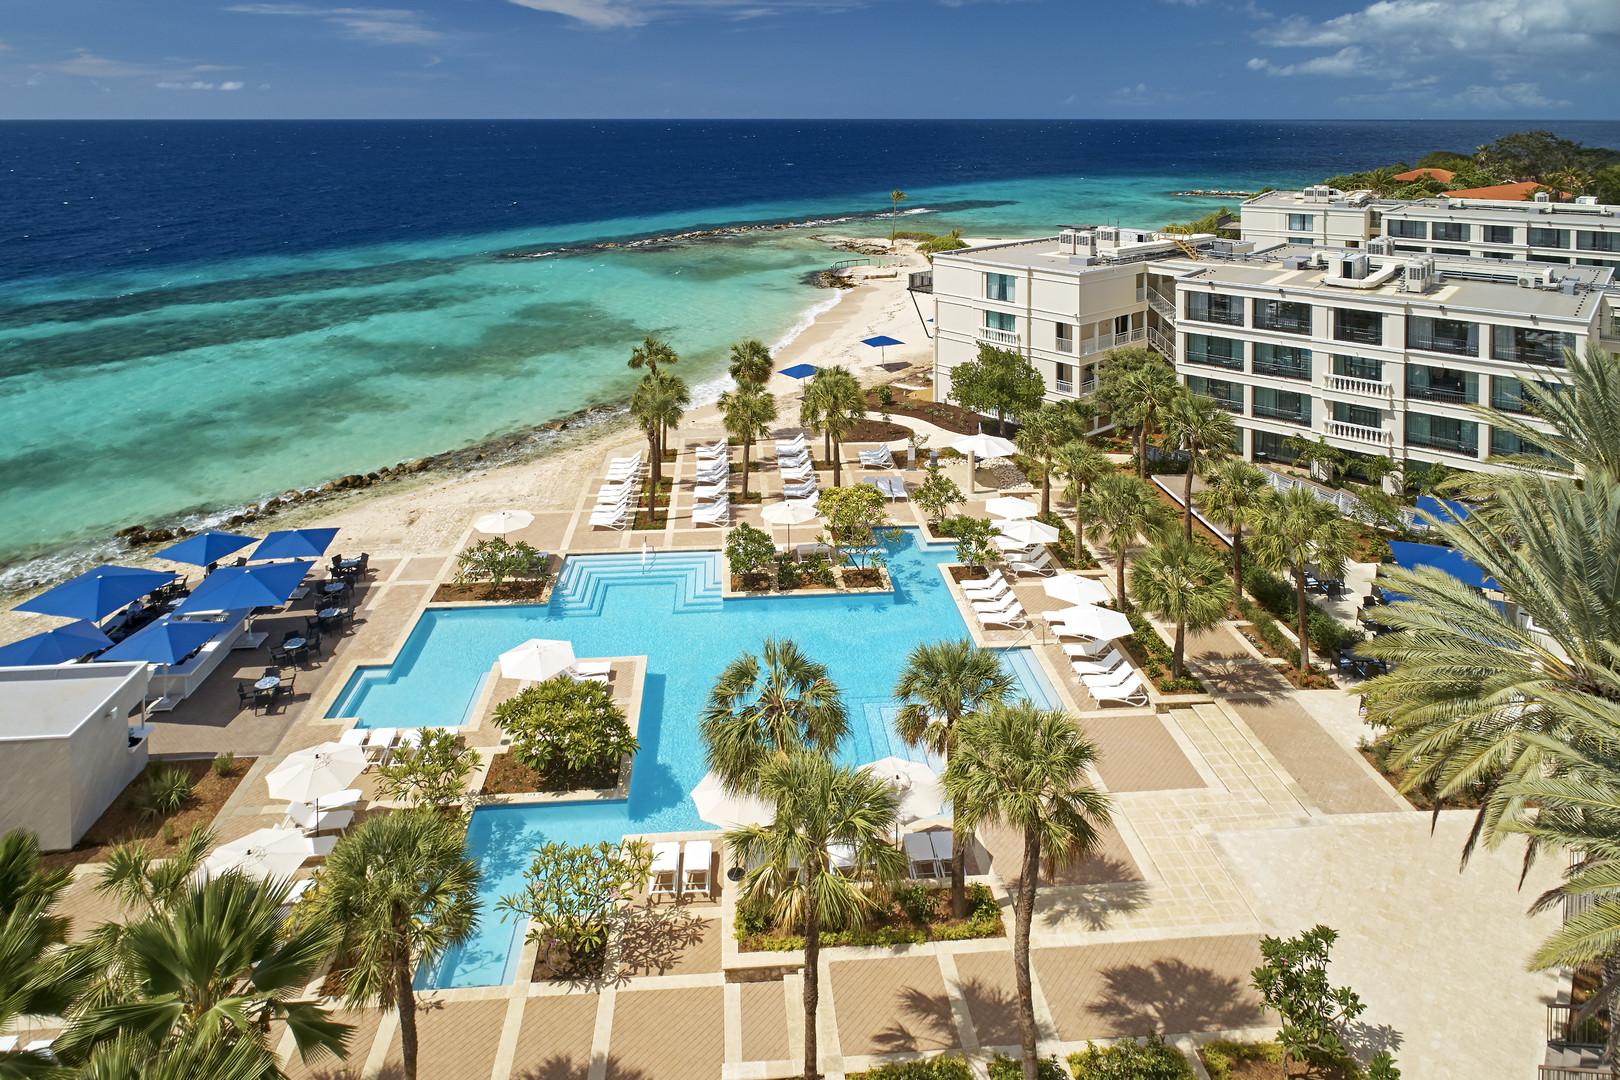 Curacao Marriott Beach Resort